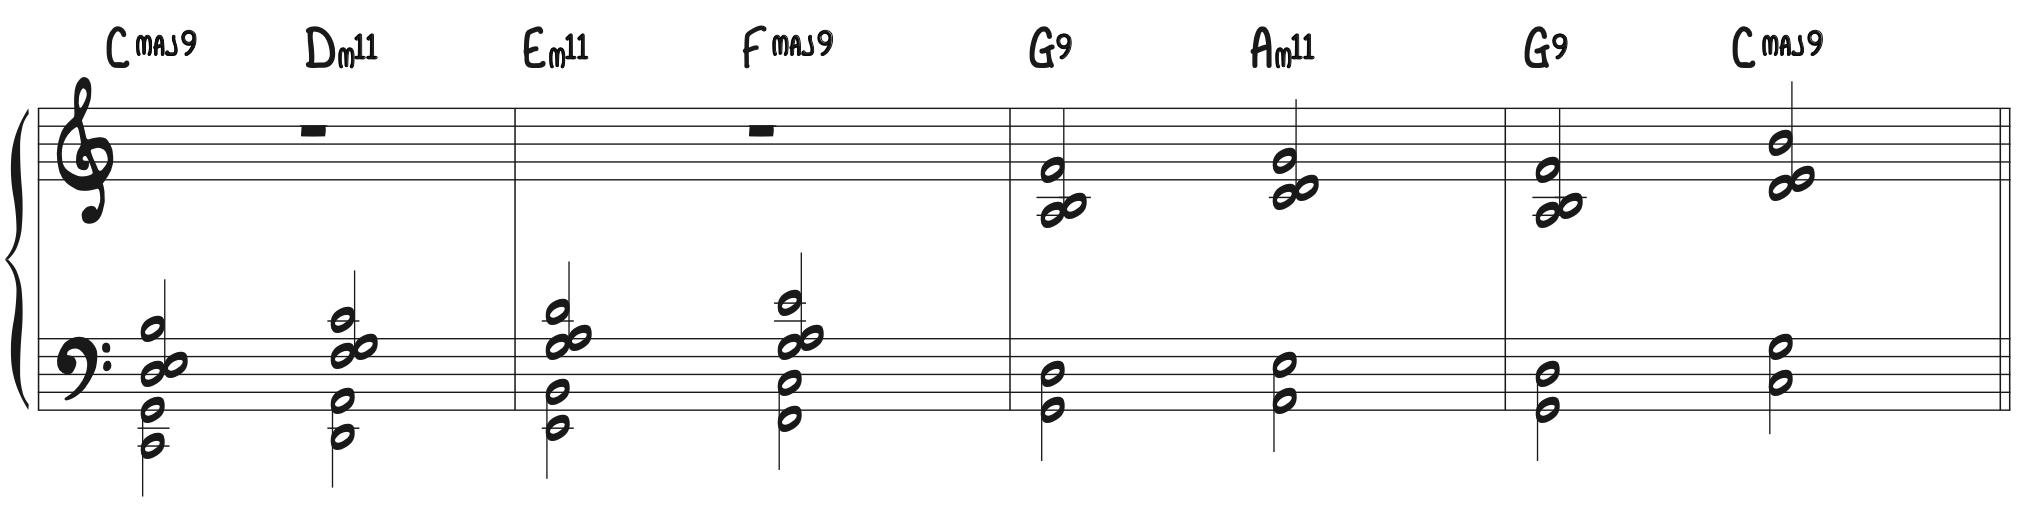 Magic Chord Exercise 8vb